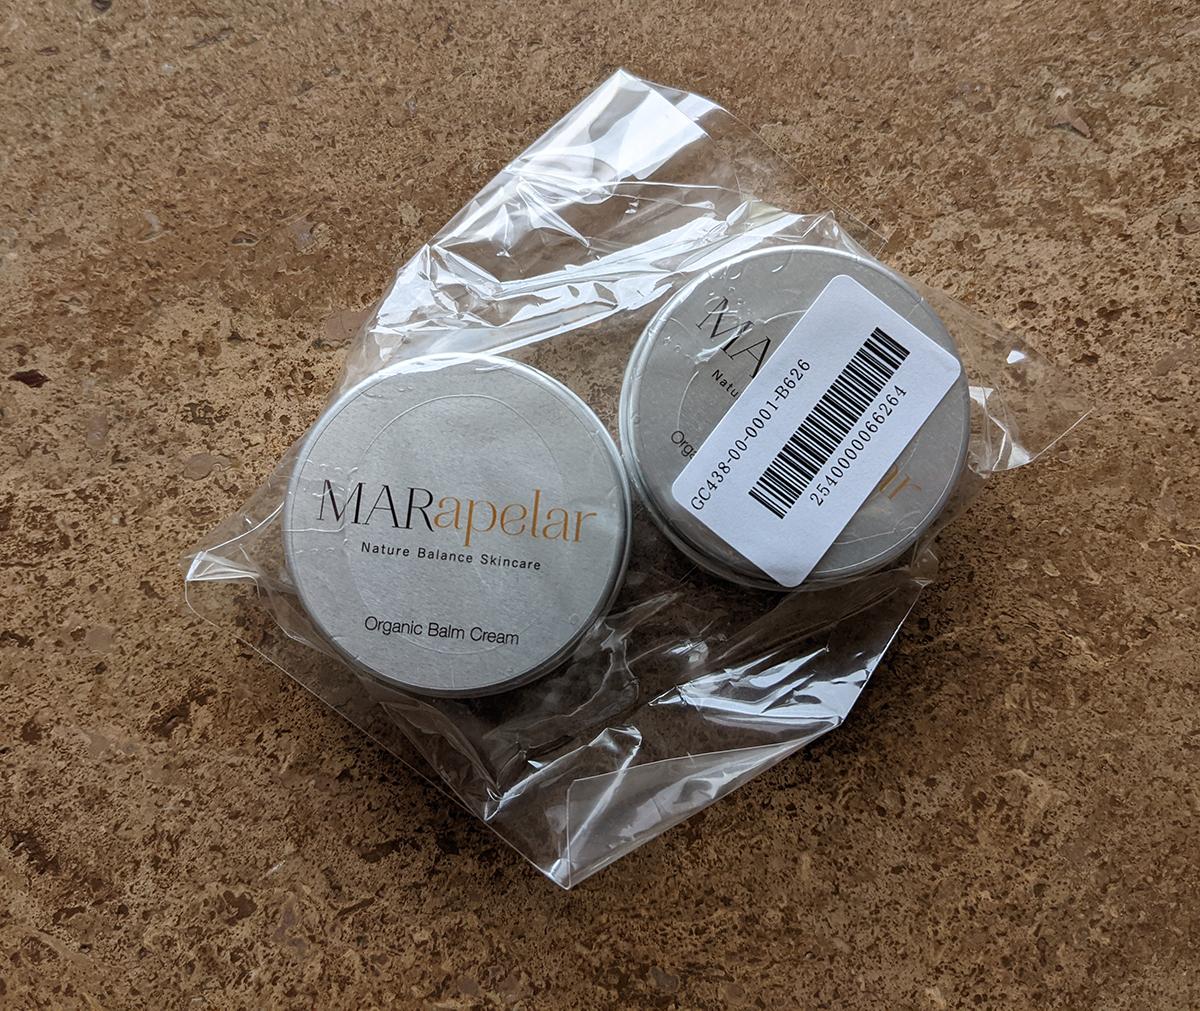 MAR apelar/オーガニックバームクリーム お得な2個セット